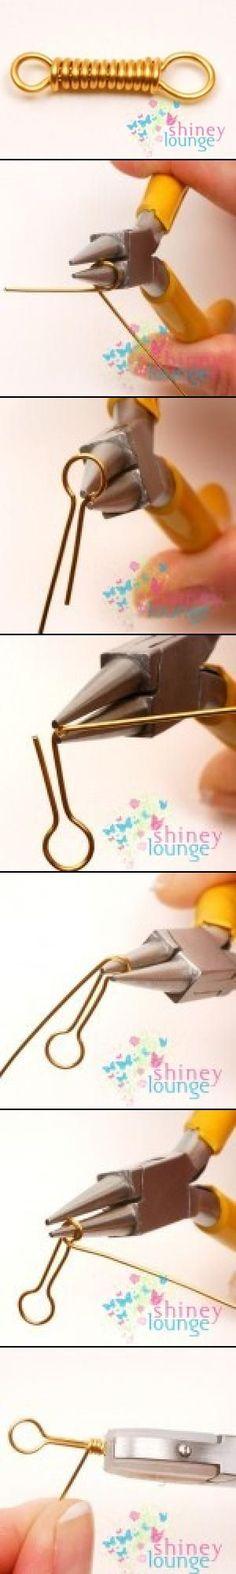 http://www.jewelleryrocks.co.uk/shineylounge/2009/05/20/free-wire-work-eye-for-hook-clasp/